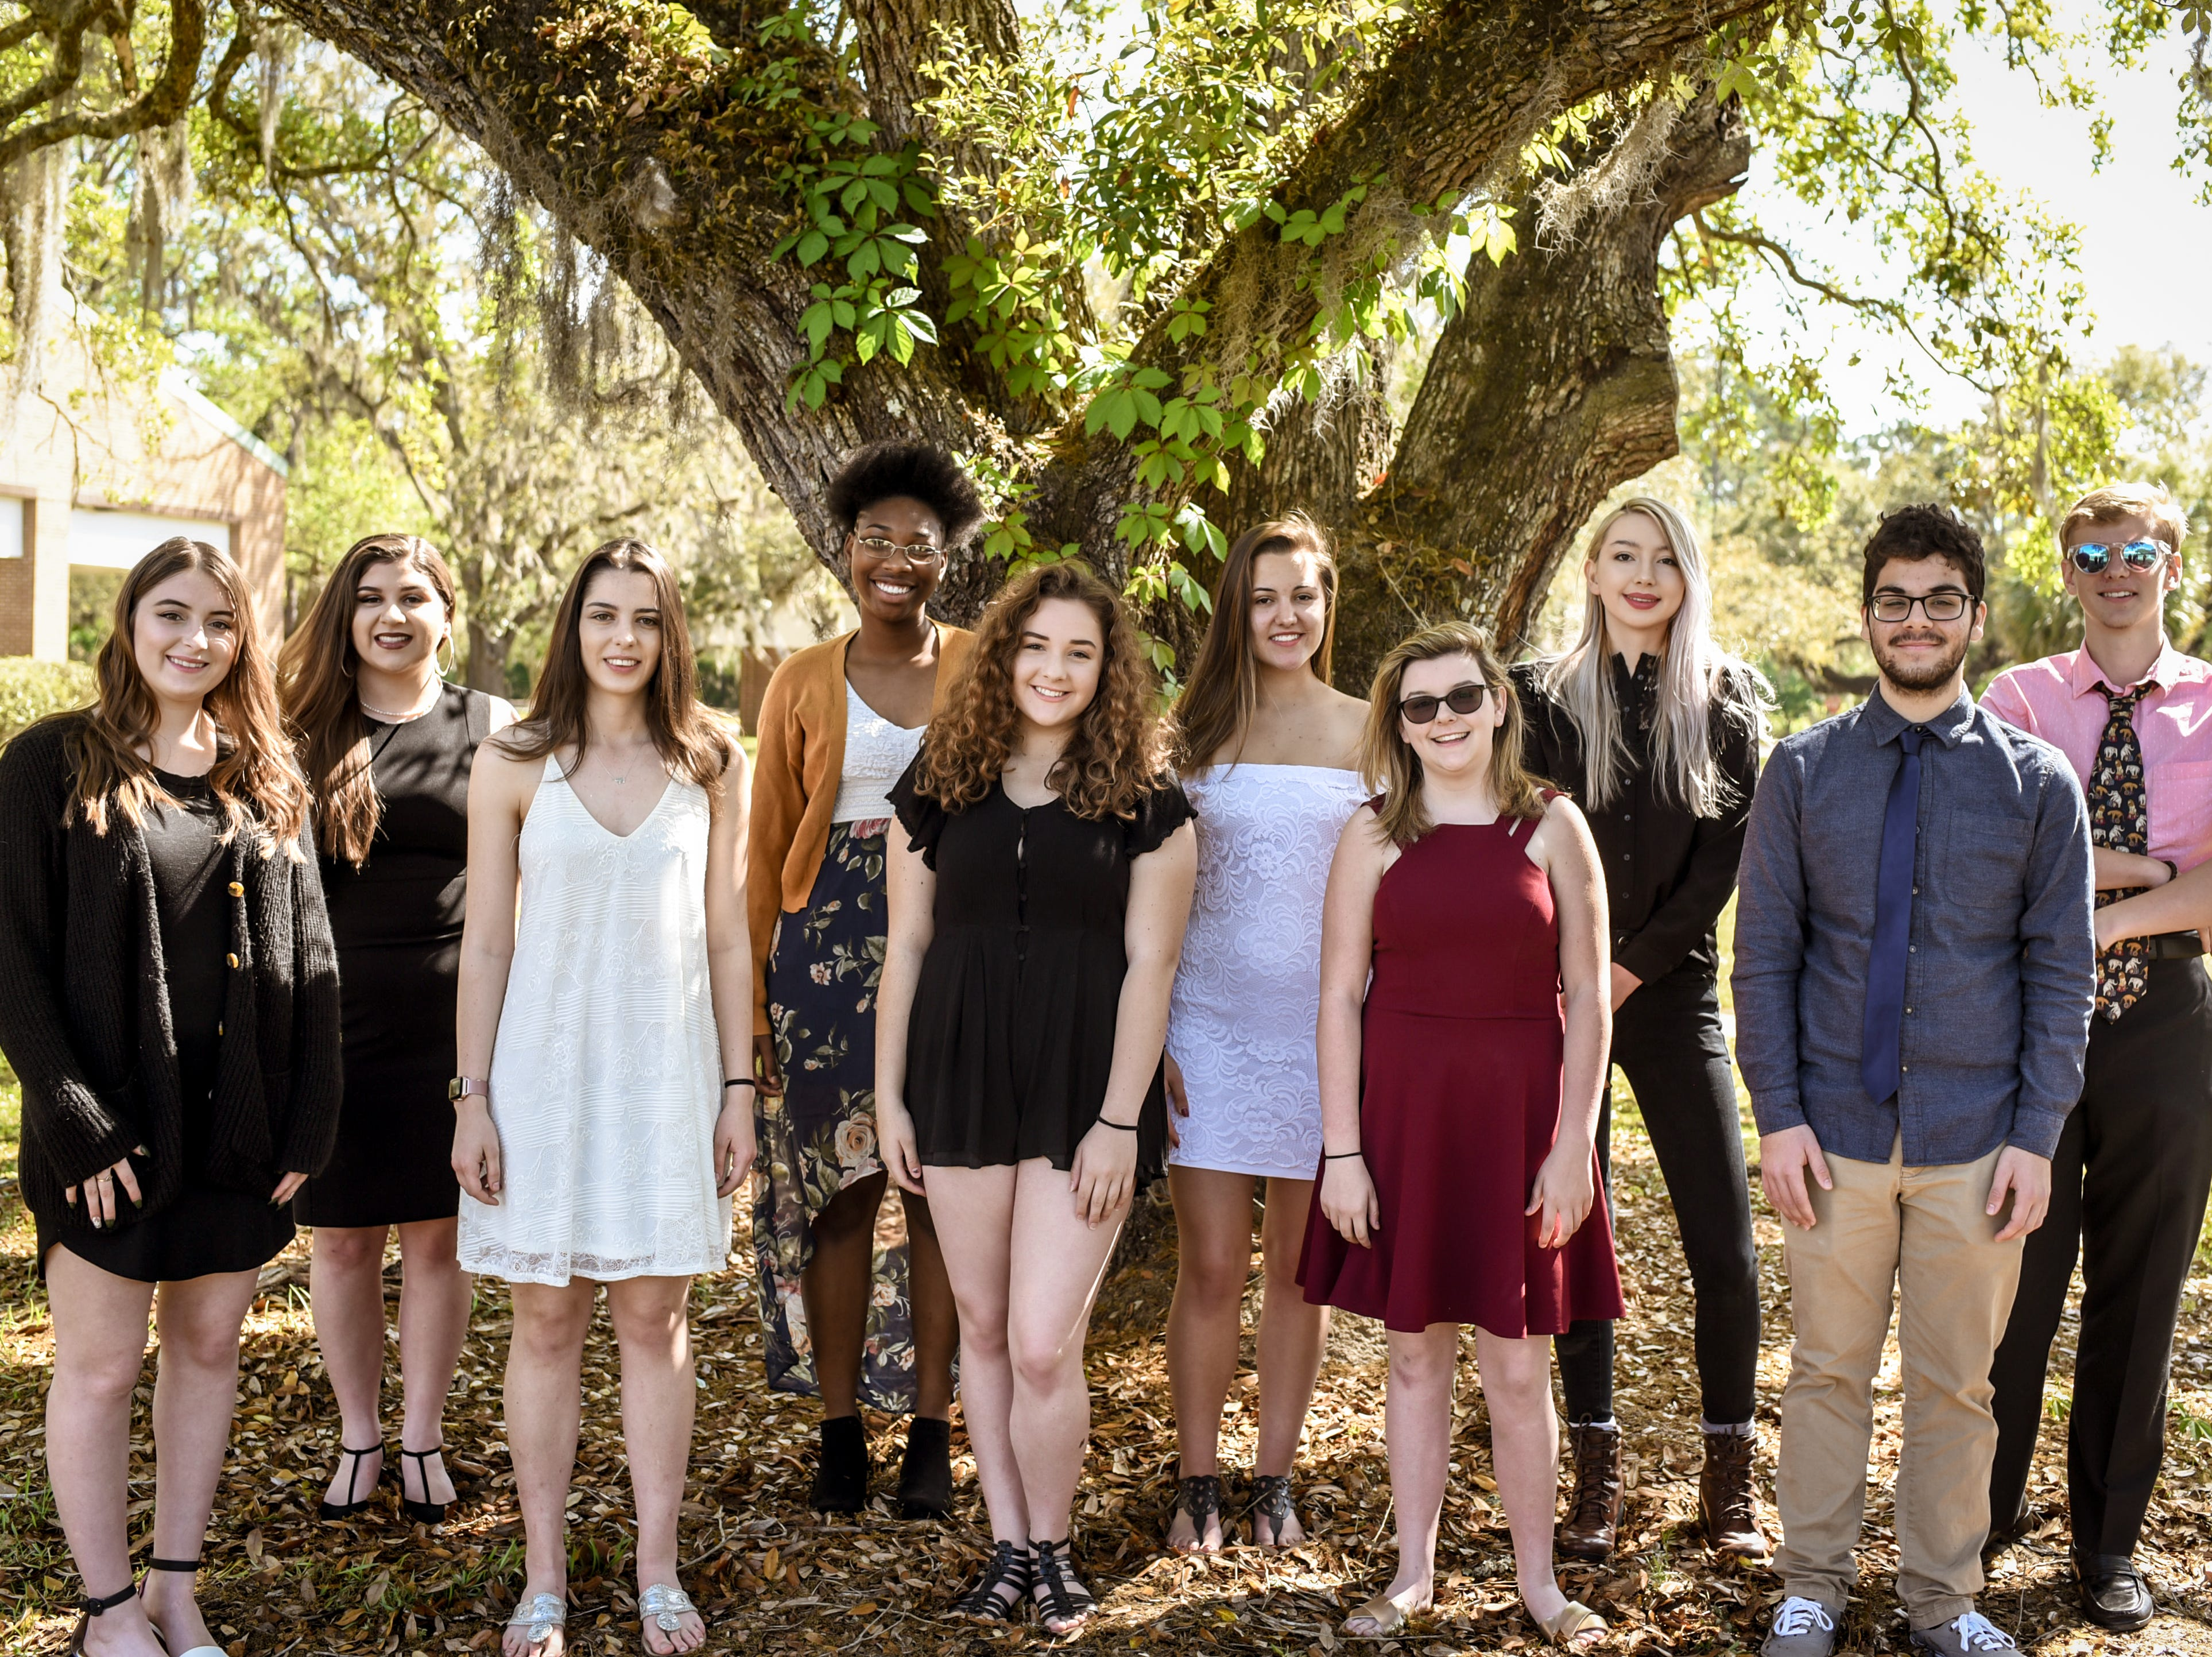 Leon County Virtual School Class of 2019